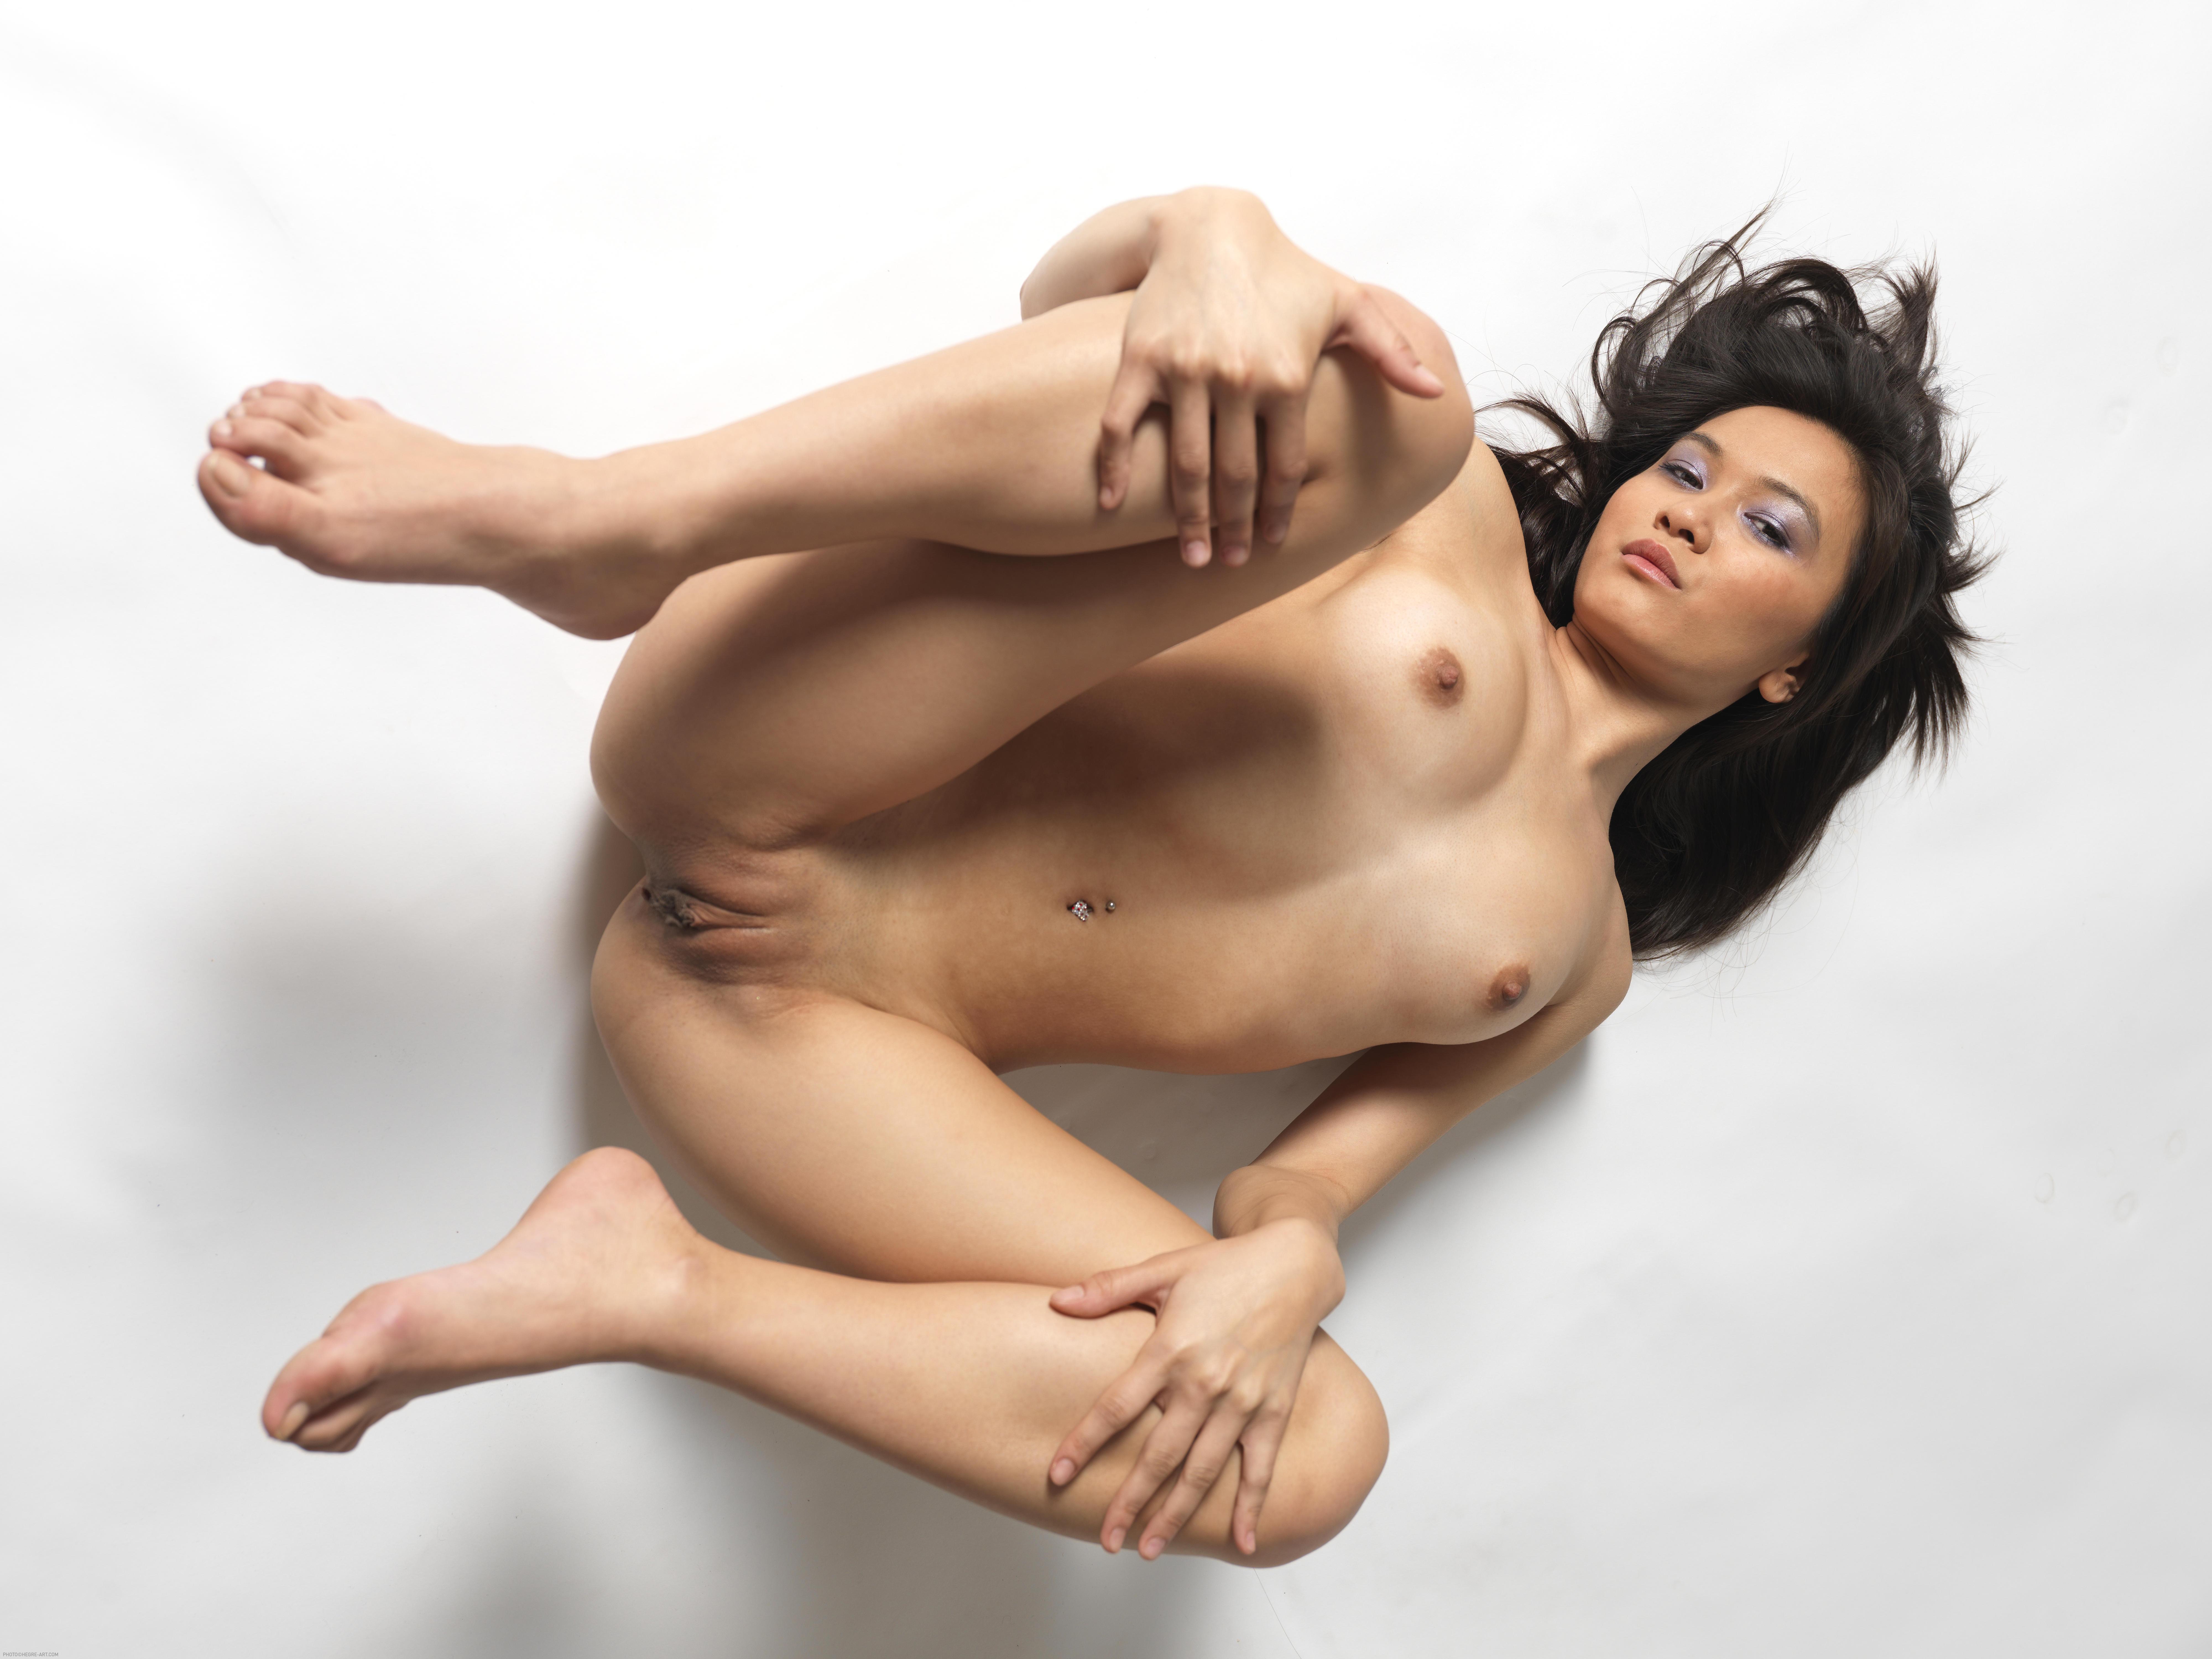 hegre art thai porno